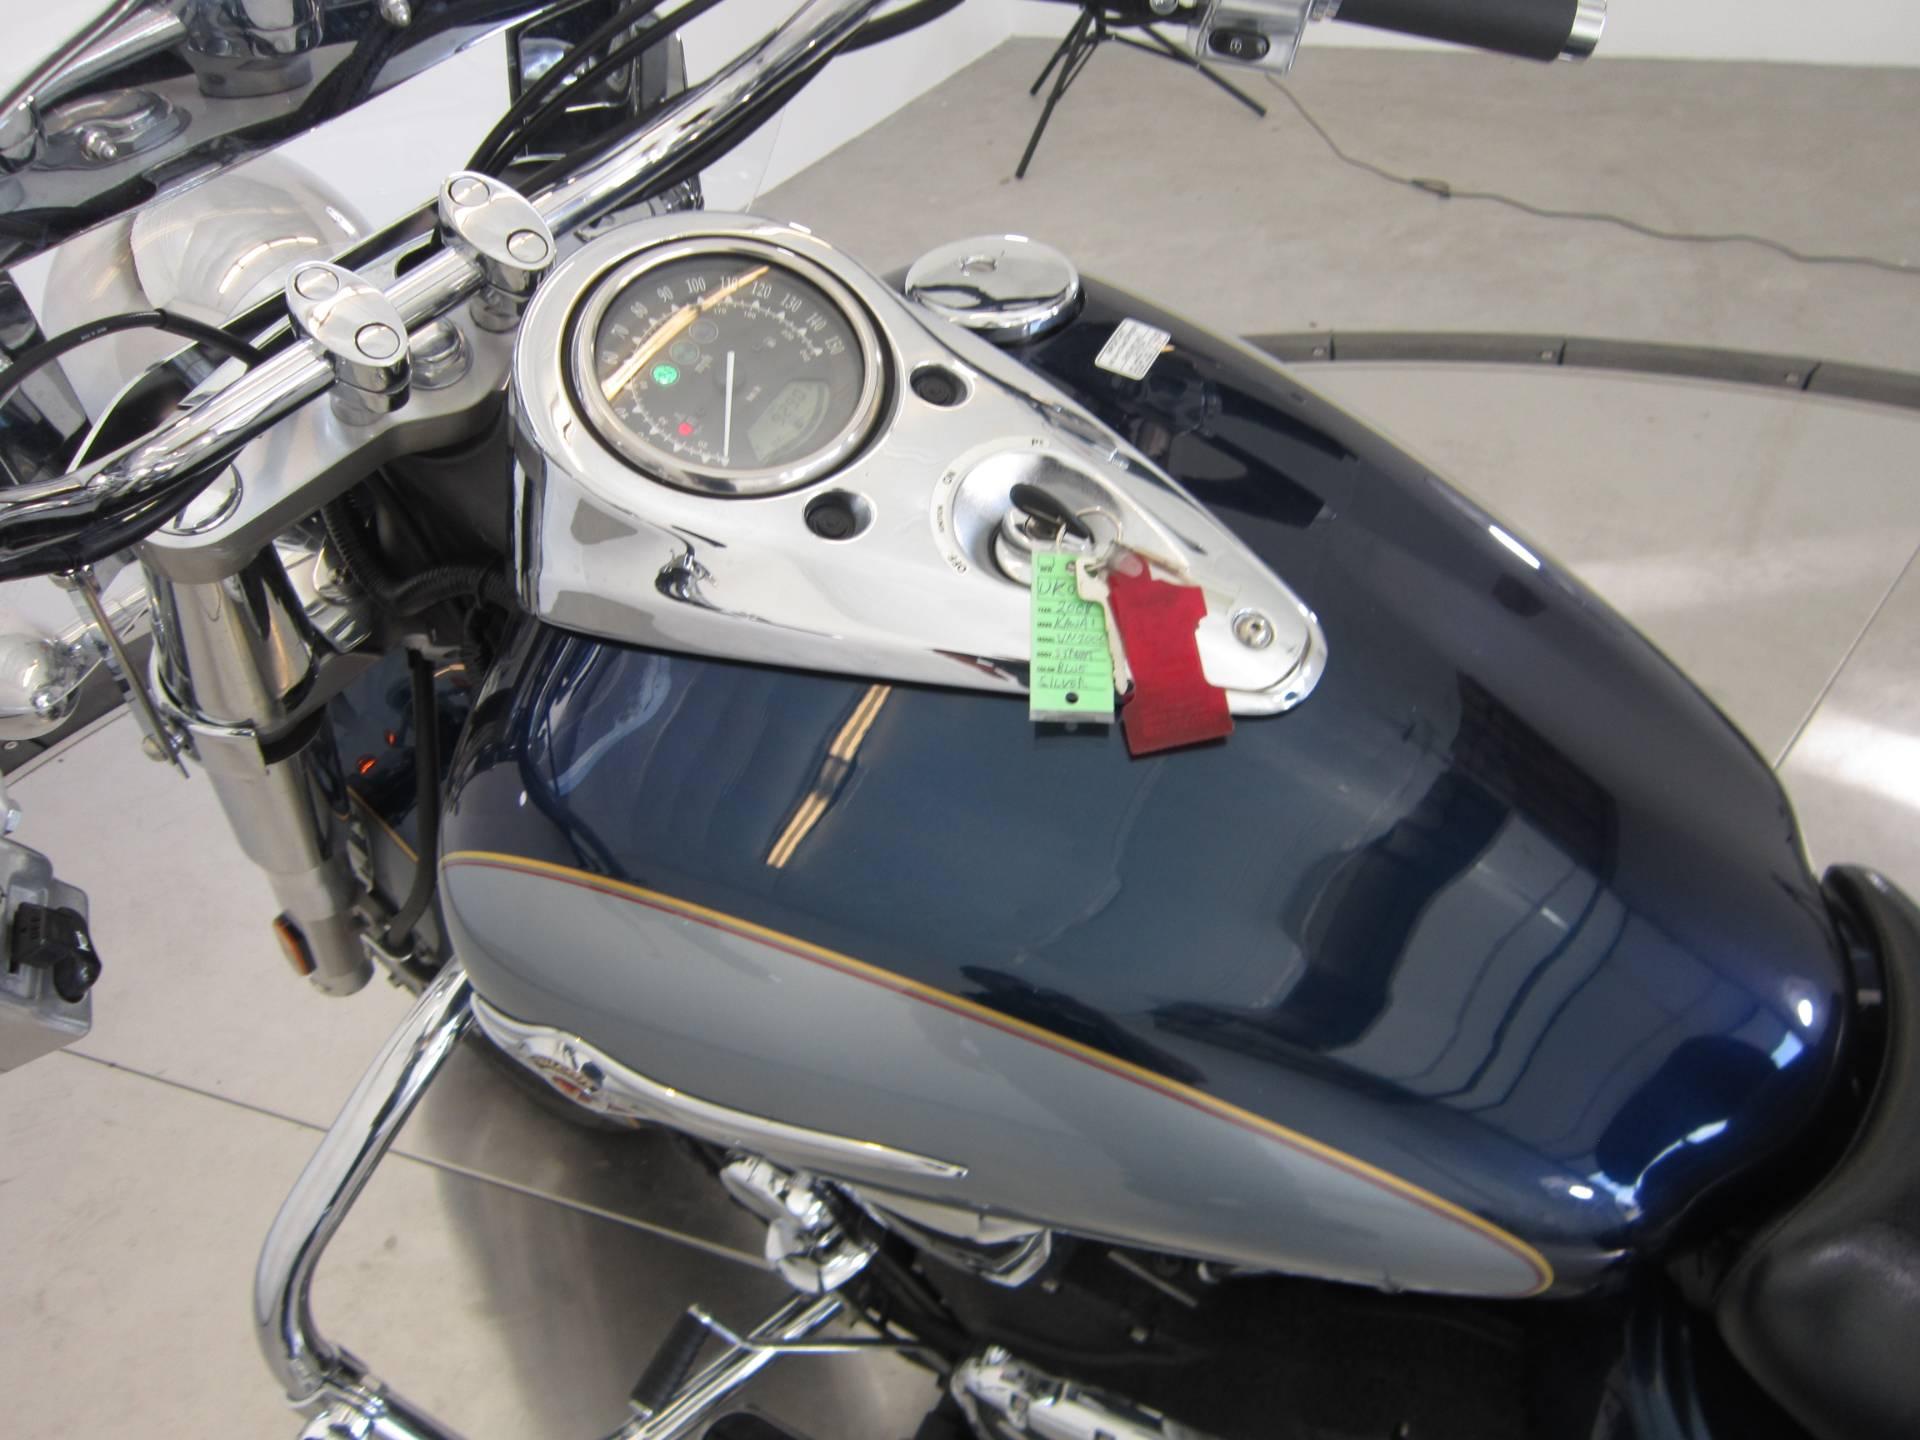 2008 Kawasaki Vulcan® 2000 Classic LT in Greenwood Village, Colorado